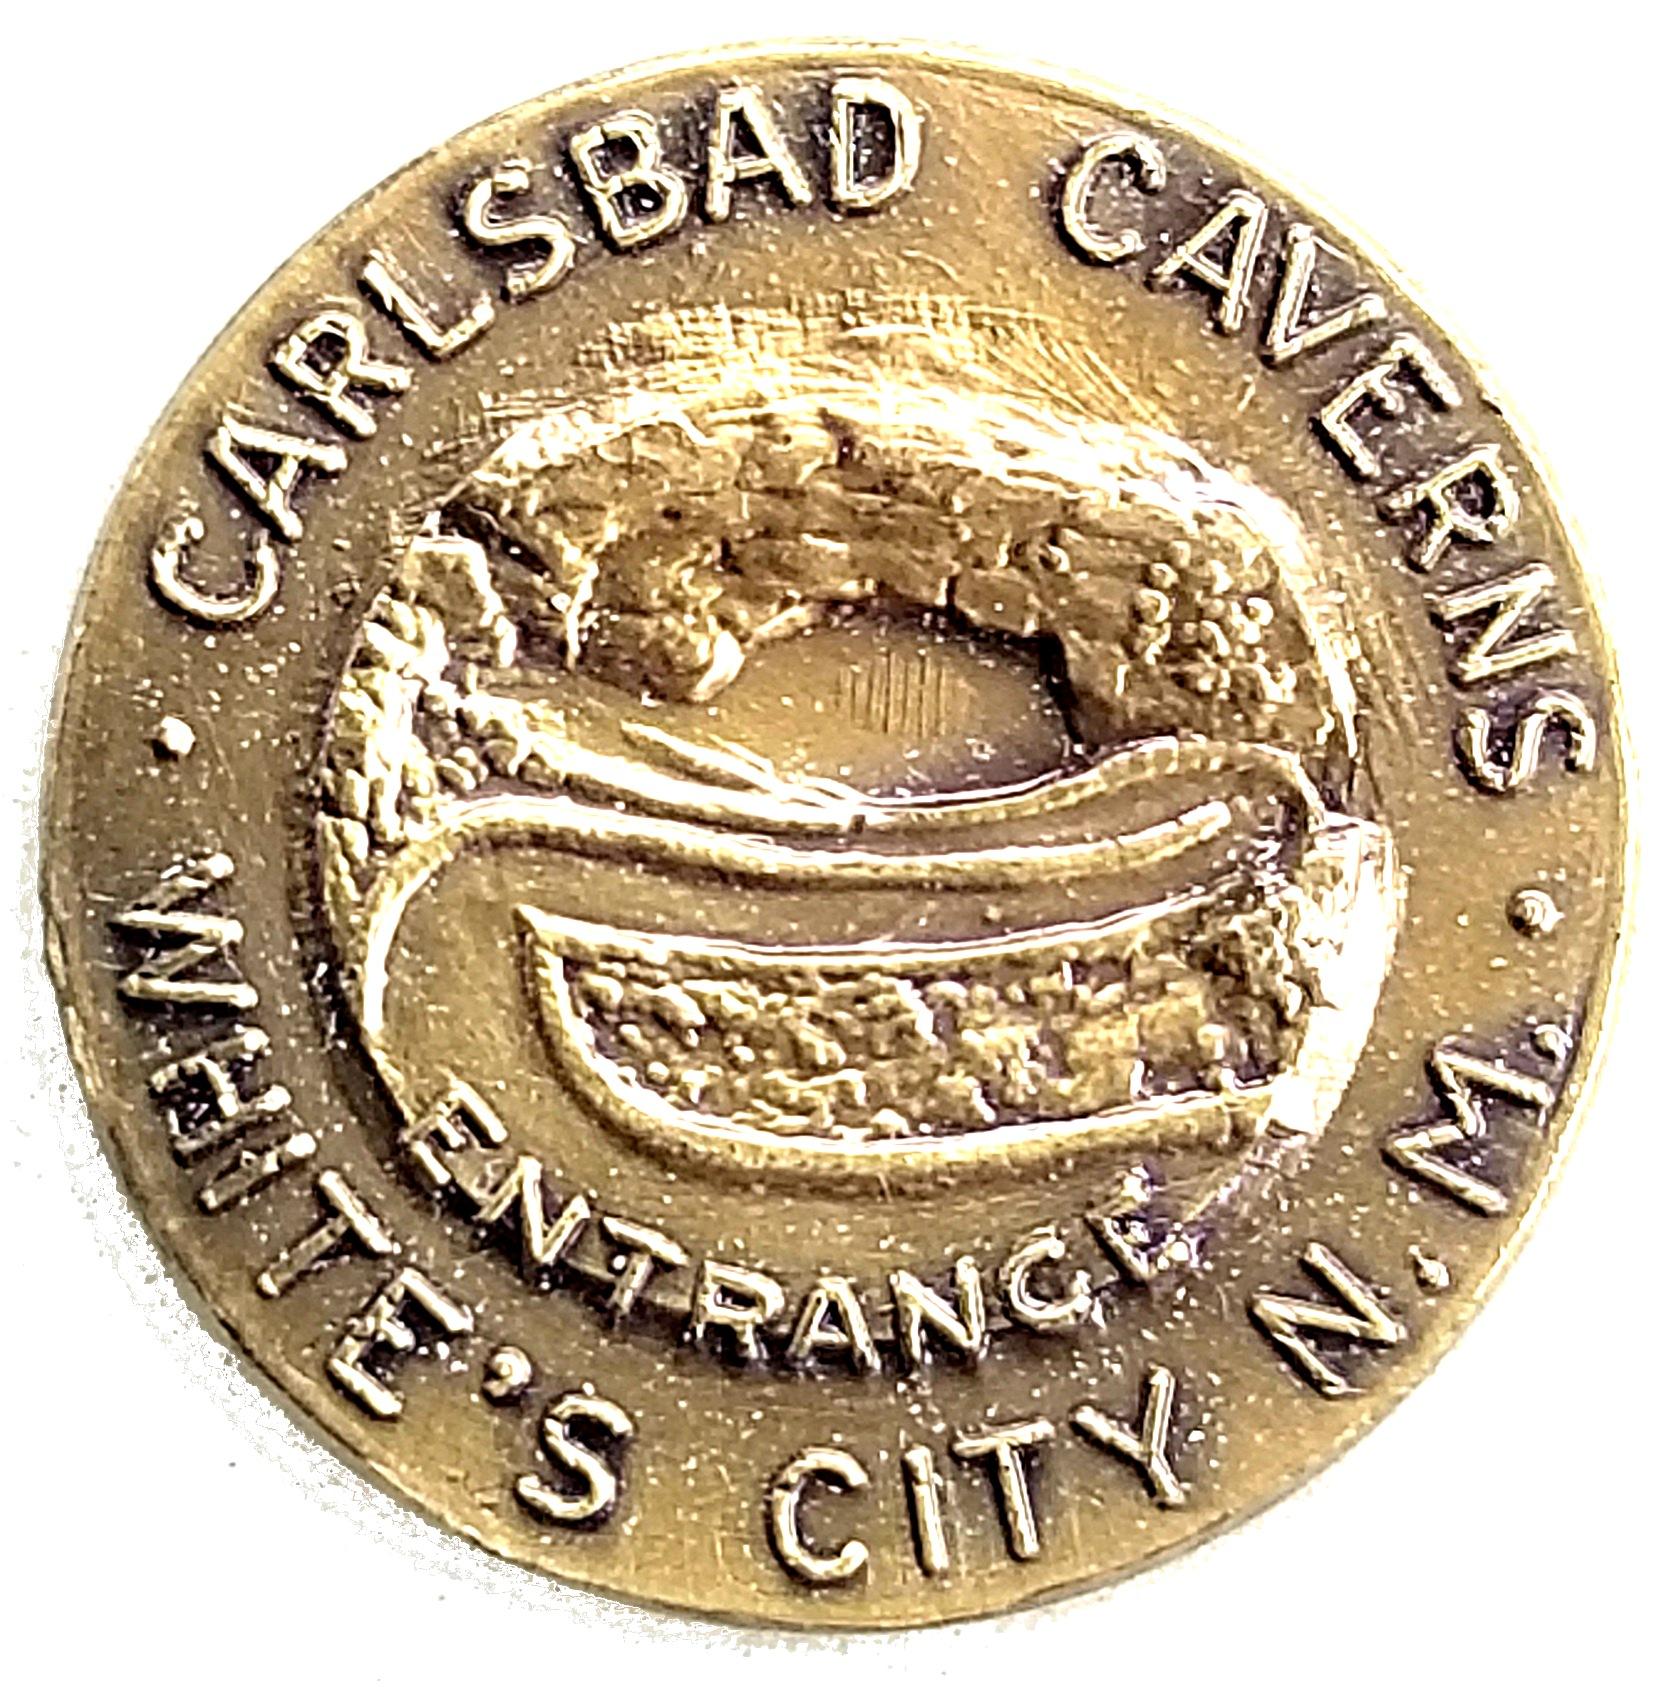 carlsbad coin